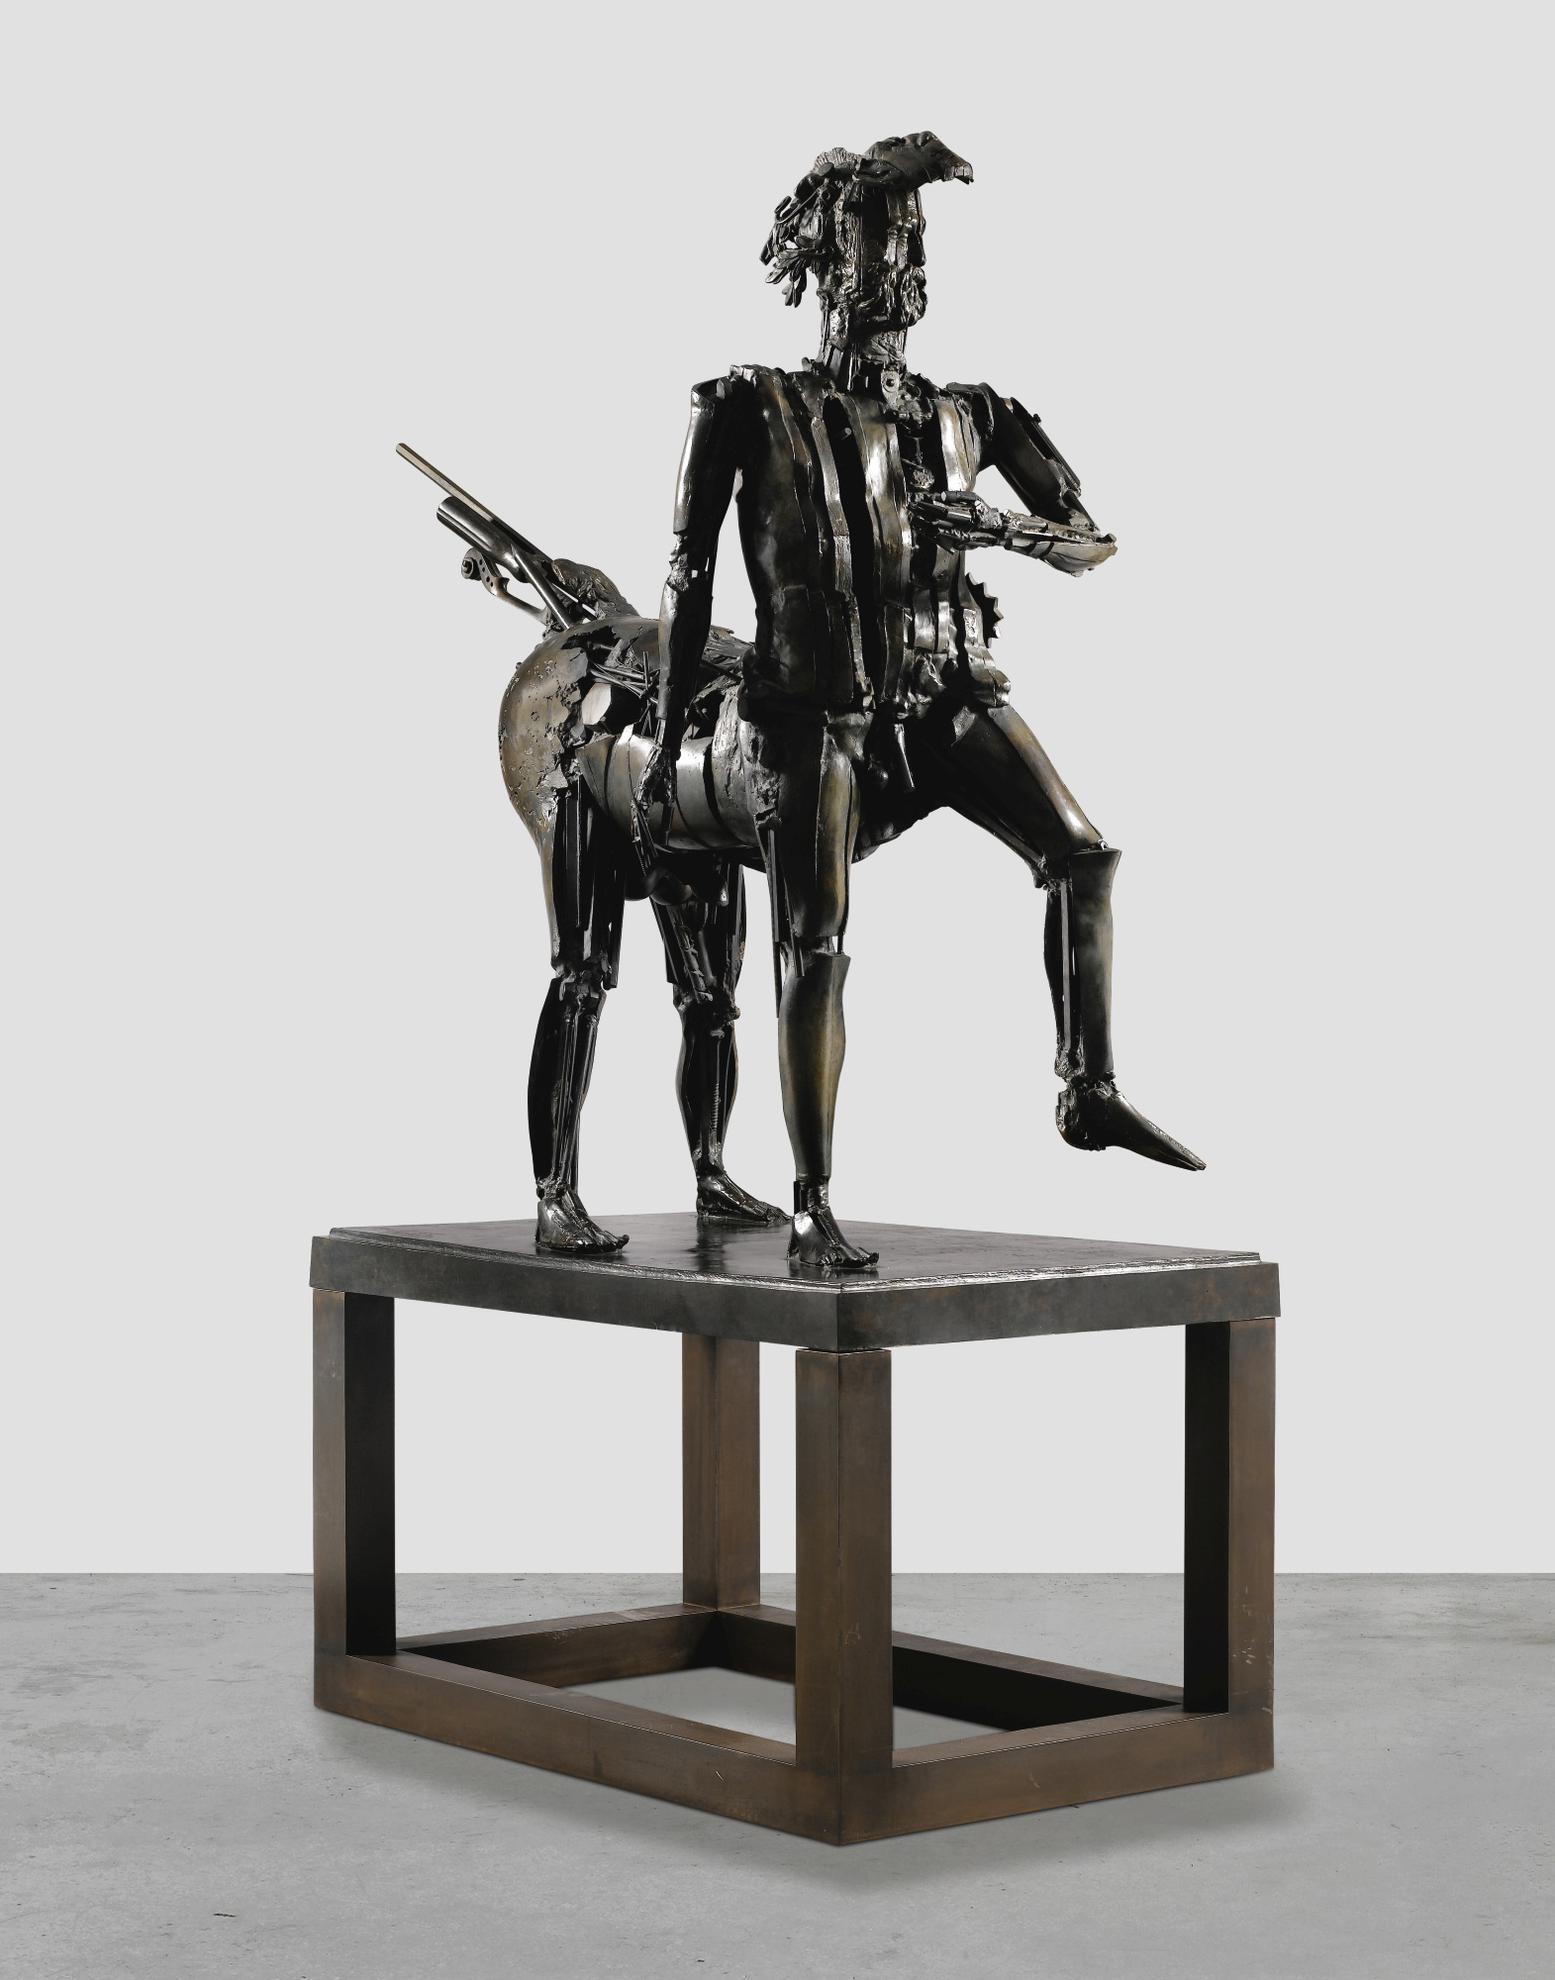 Cesar-Le Centaure-1983